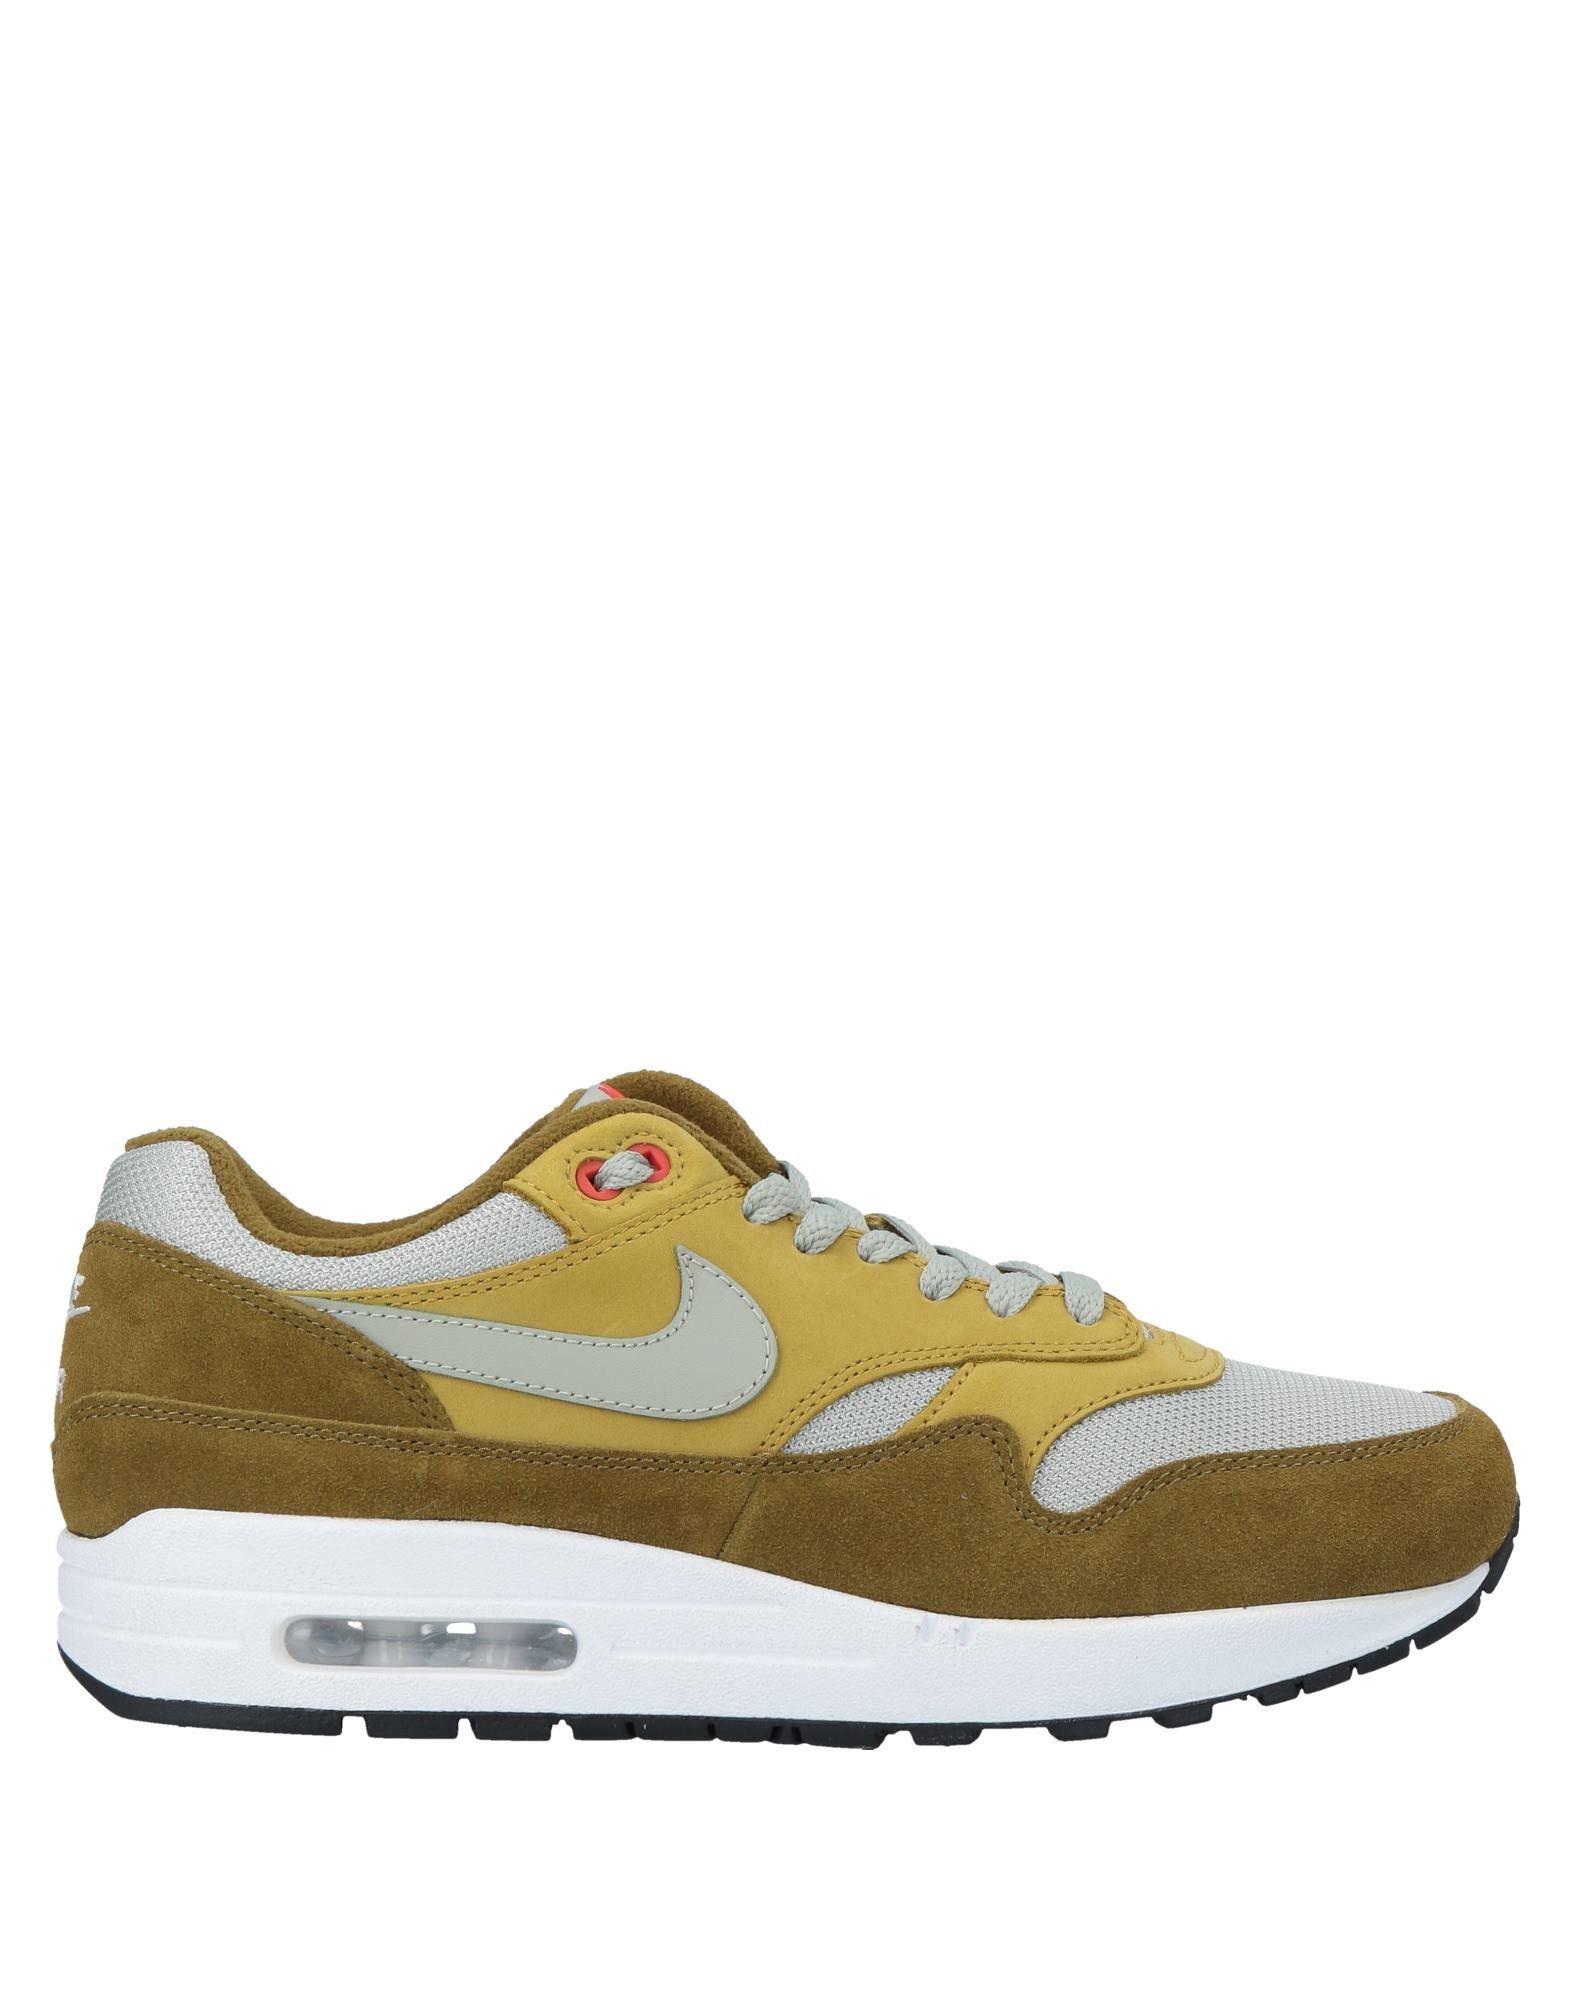 50% price outlet online no sale tax best loved c5605 6569f nike footwear low tops sneakers su yoox ...